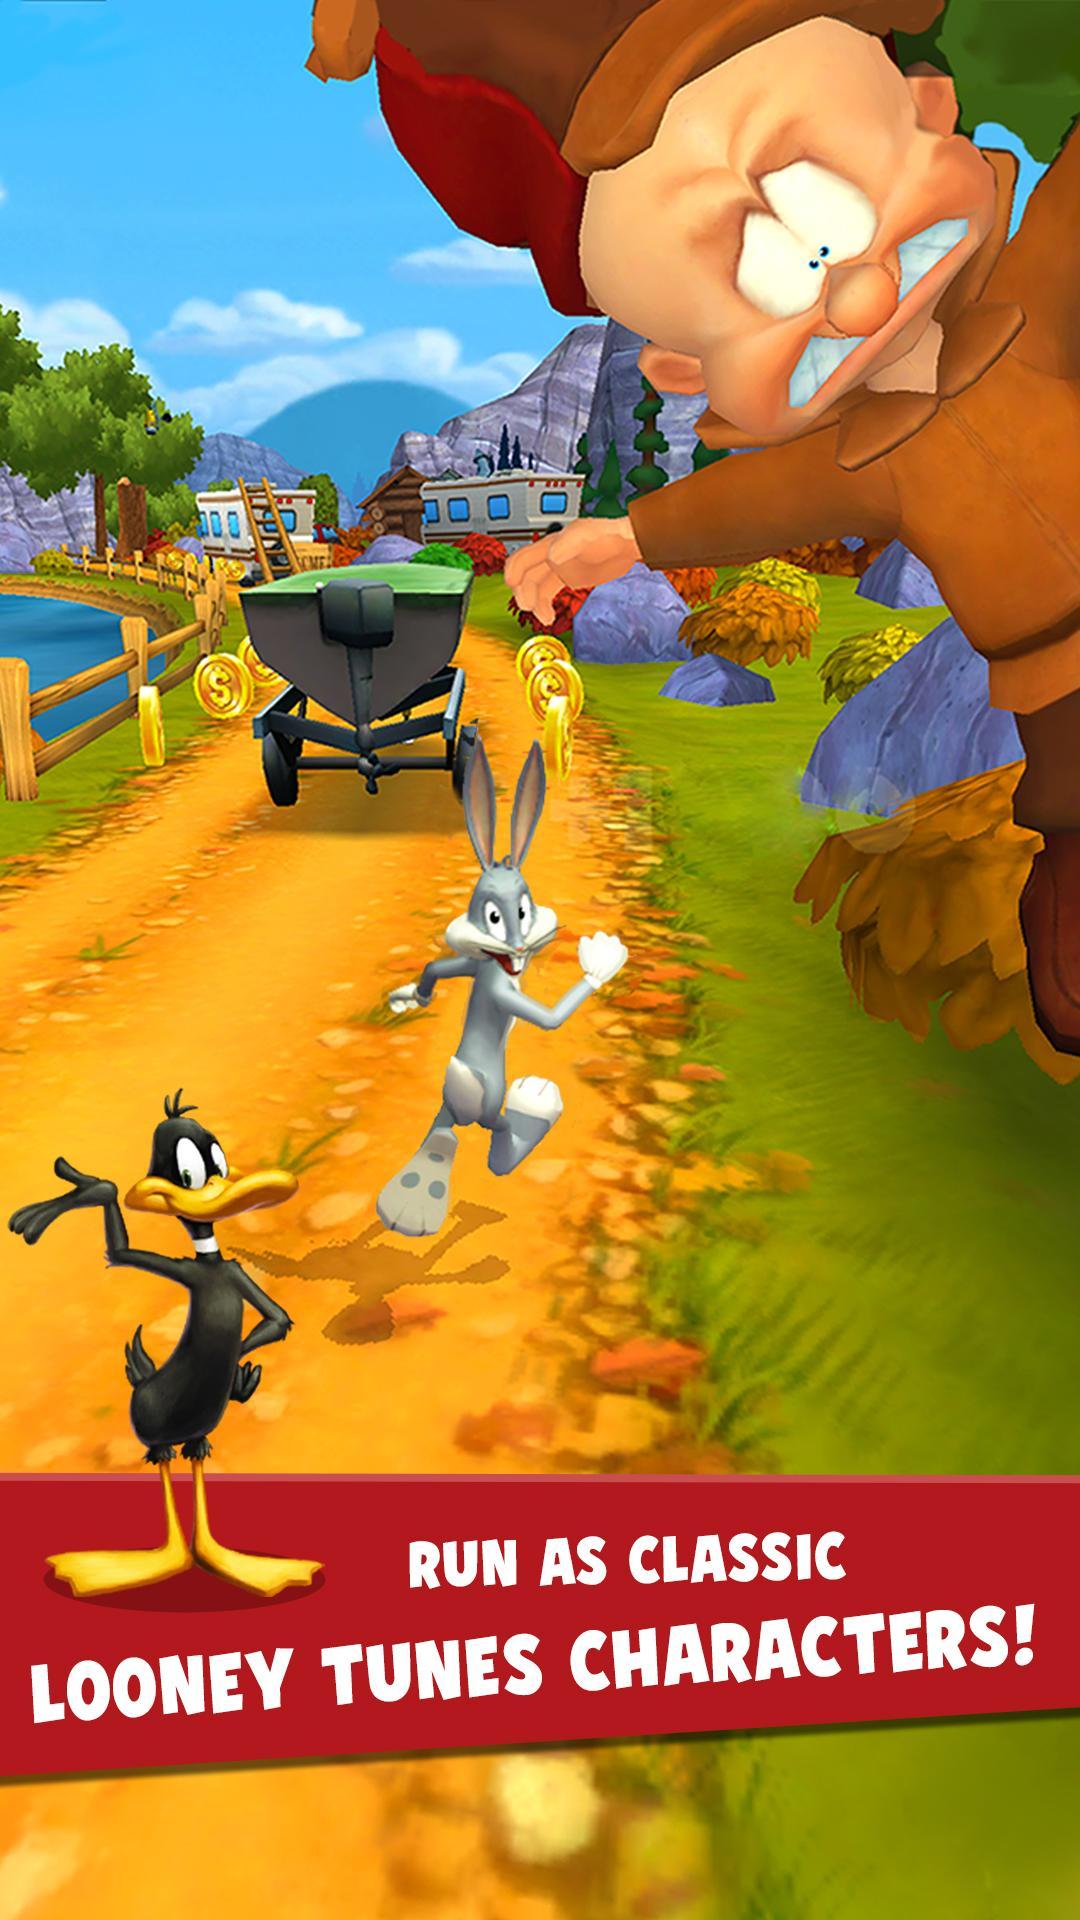 Looney Tunes Dash! screenshot #1